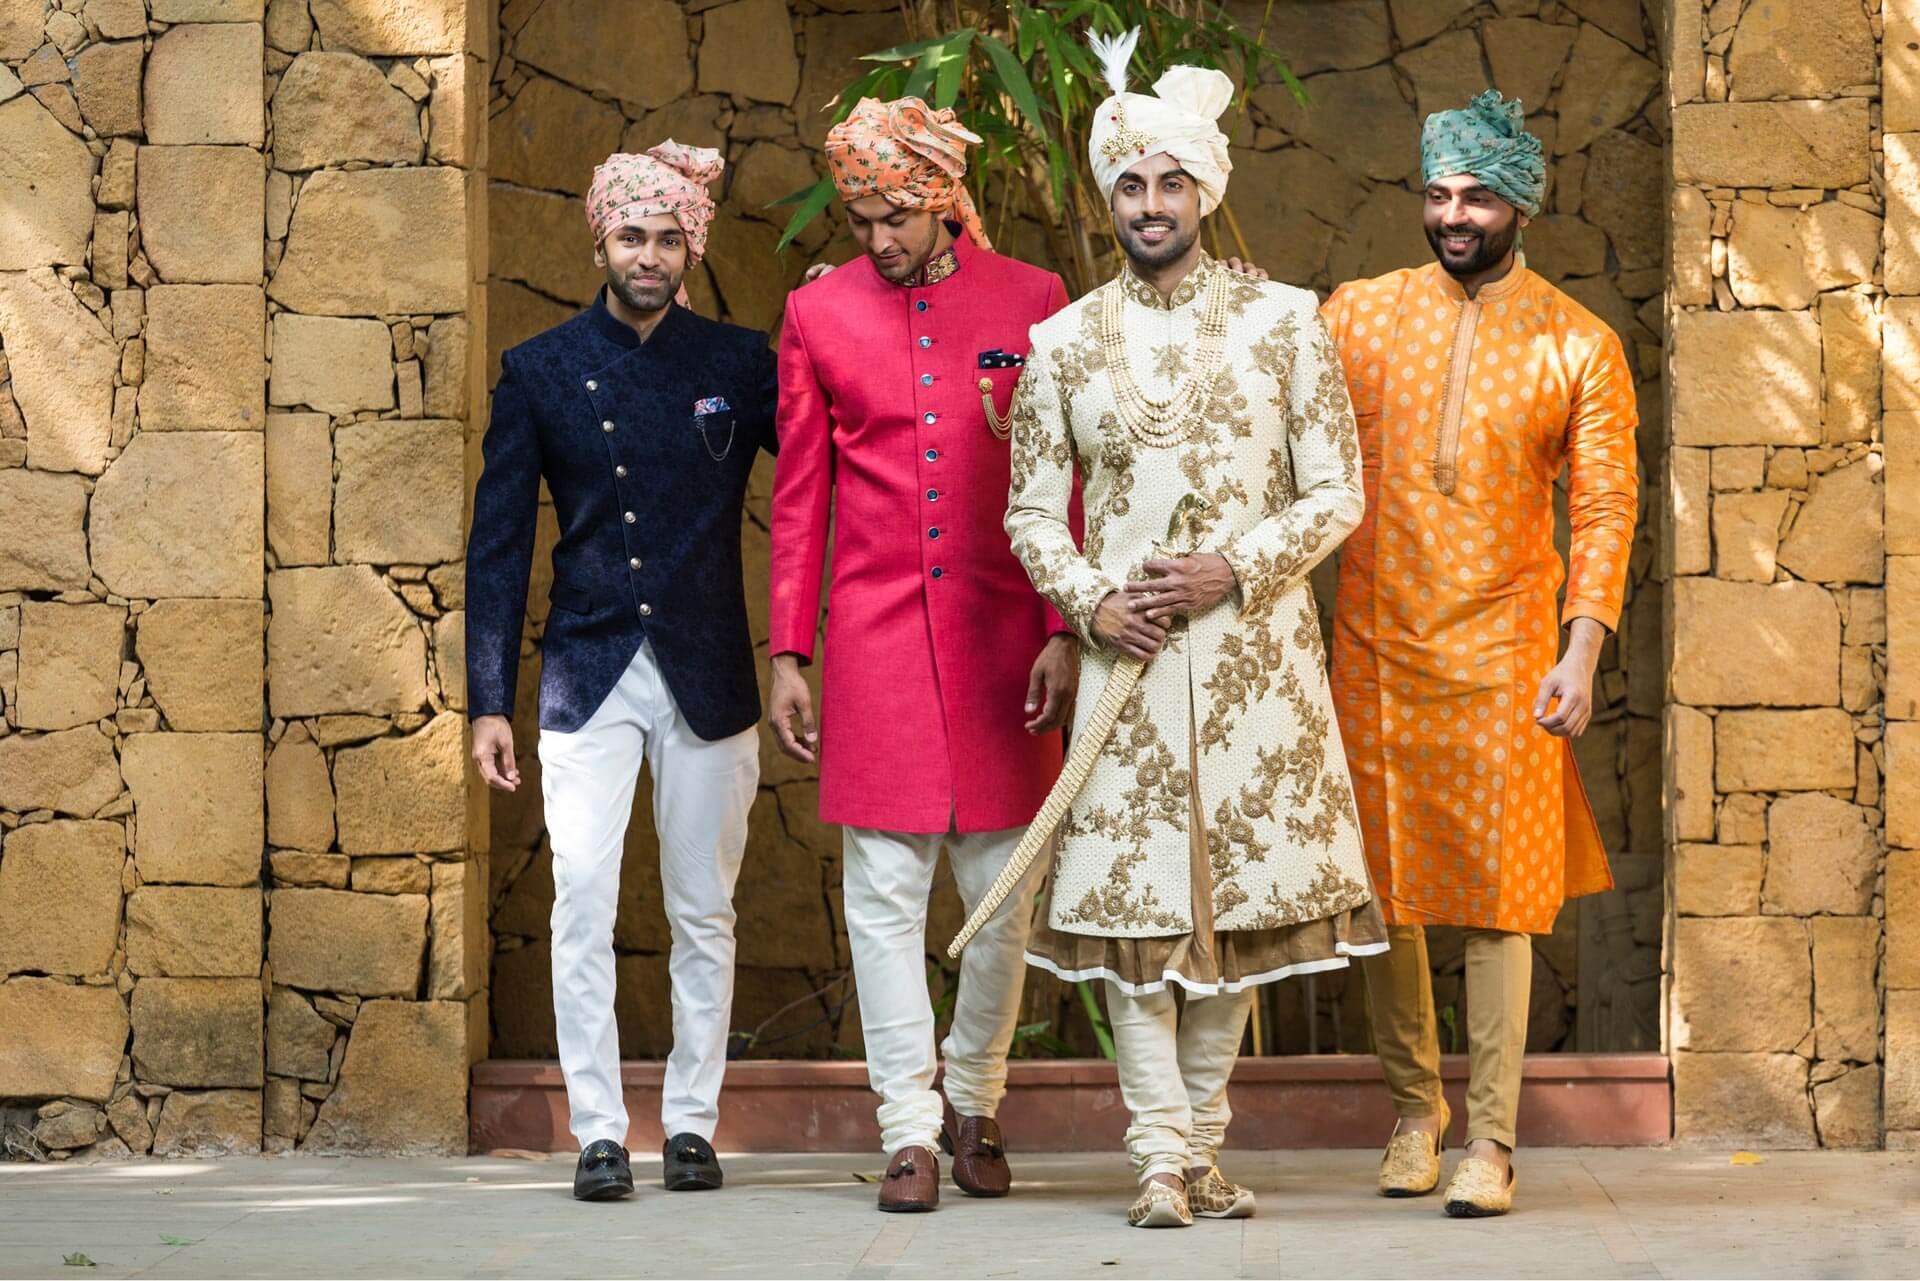 Top #141 Sensational Indian Wedding Dresses For Men!